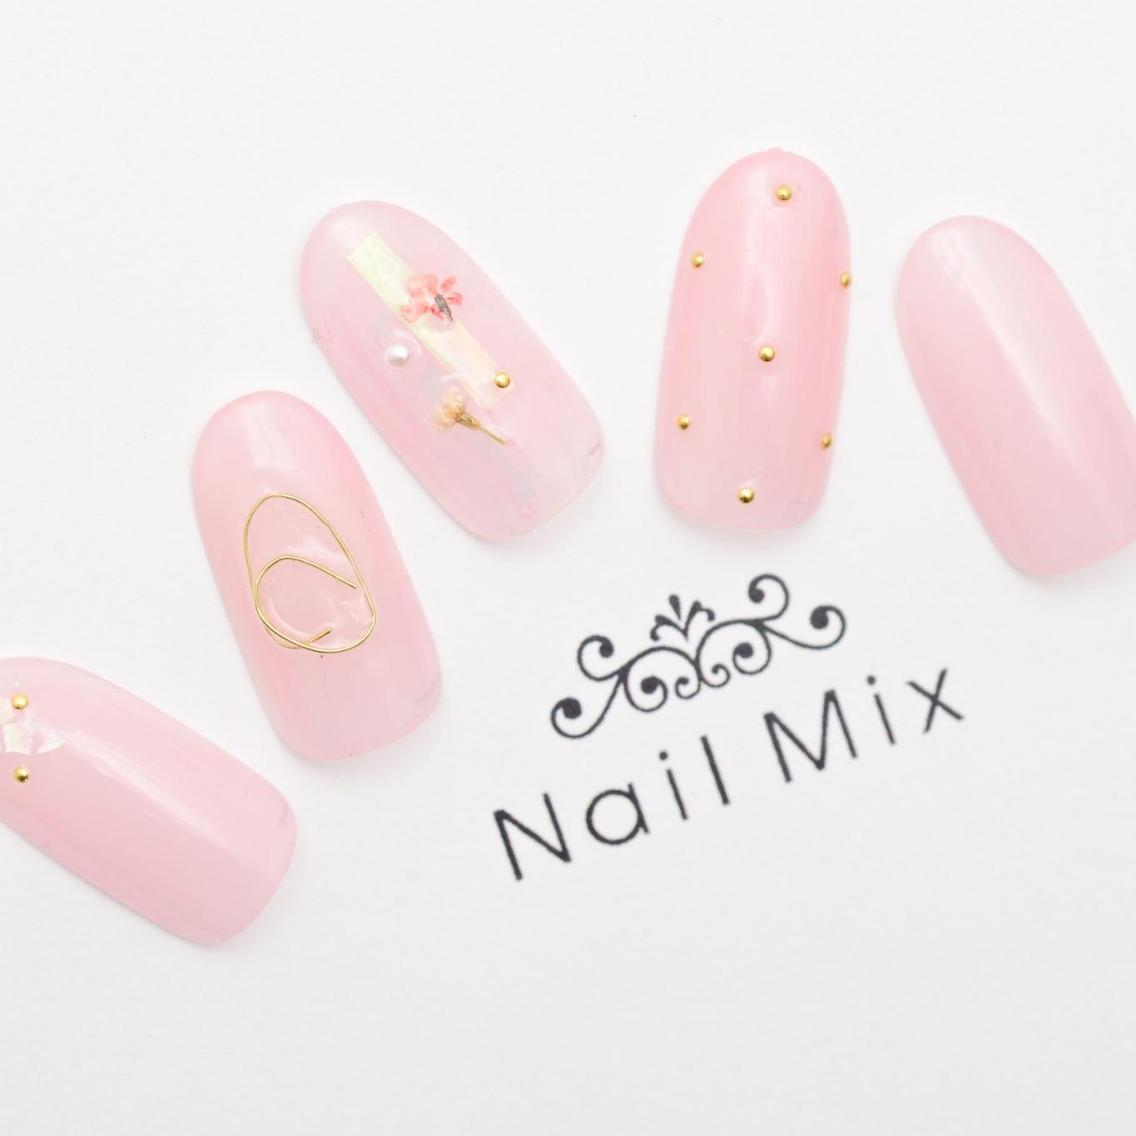 Nail Mix 福岡天神店所属・Nail Mix 福岡天神店 3の掲載